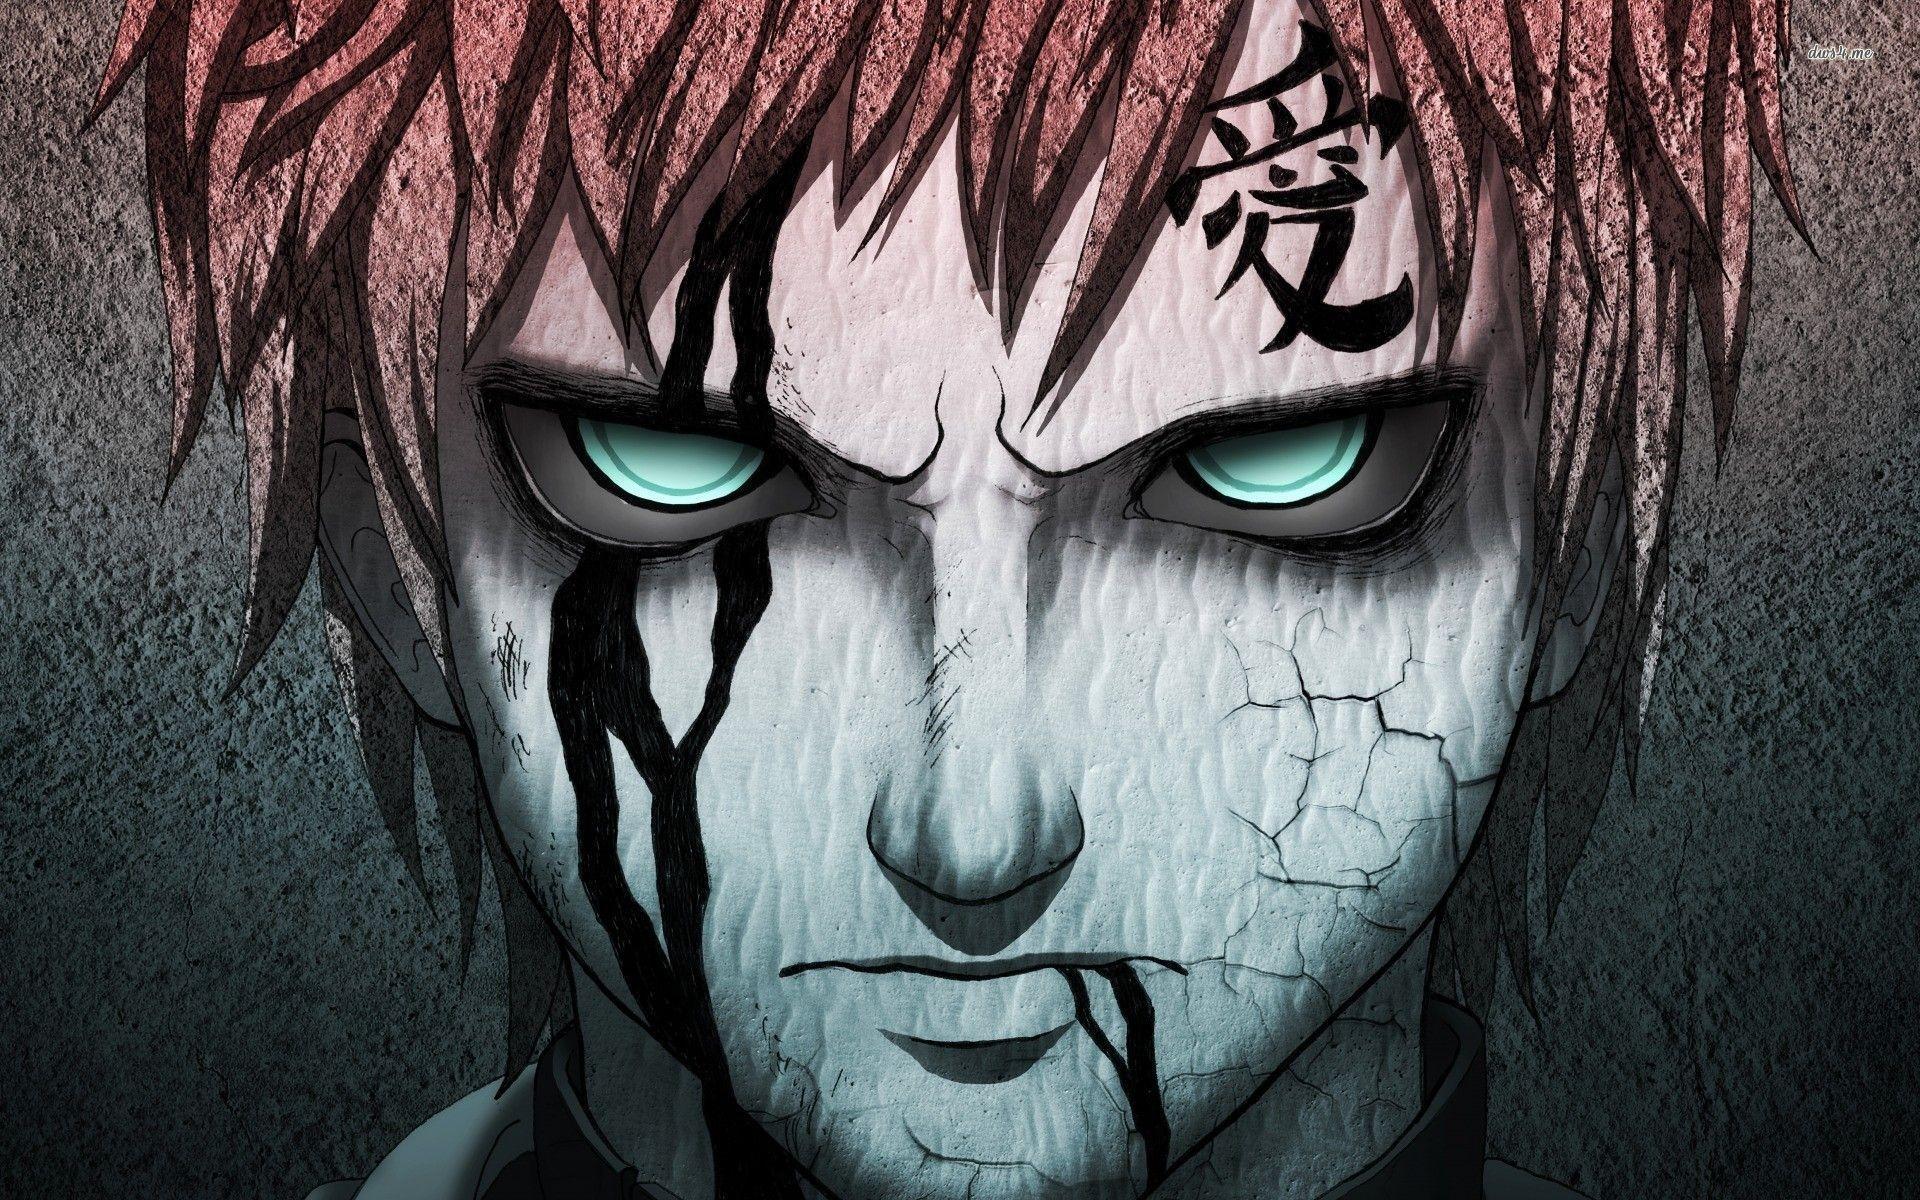 Gaara Kazekage on Naruto Shippuden HD Wallpaper